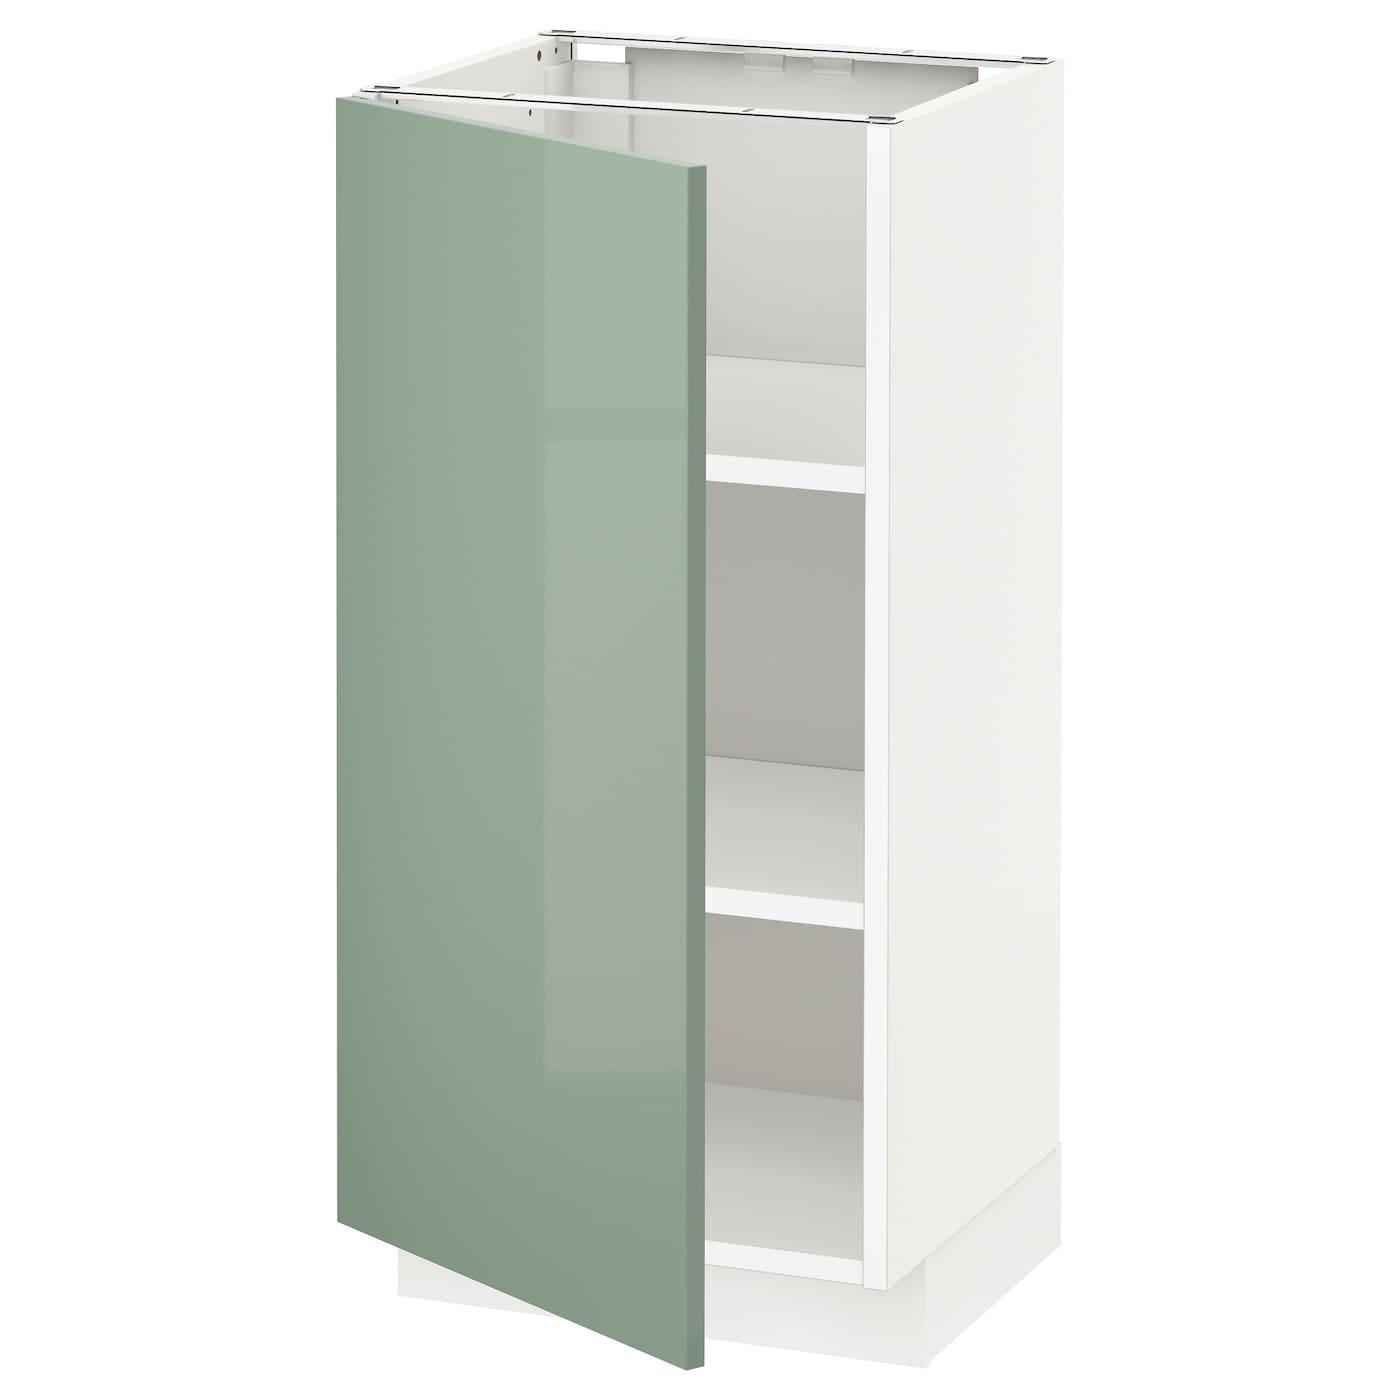 Ikea Green Kitchen Cabinets: METOD Base Cabinet With Shelves White/kallarp Light Green